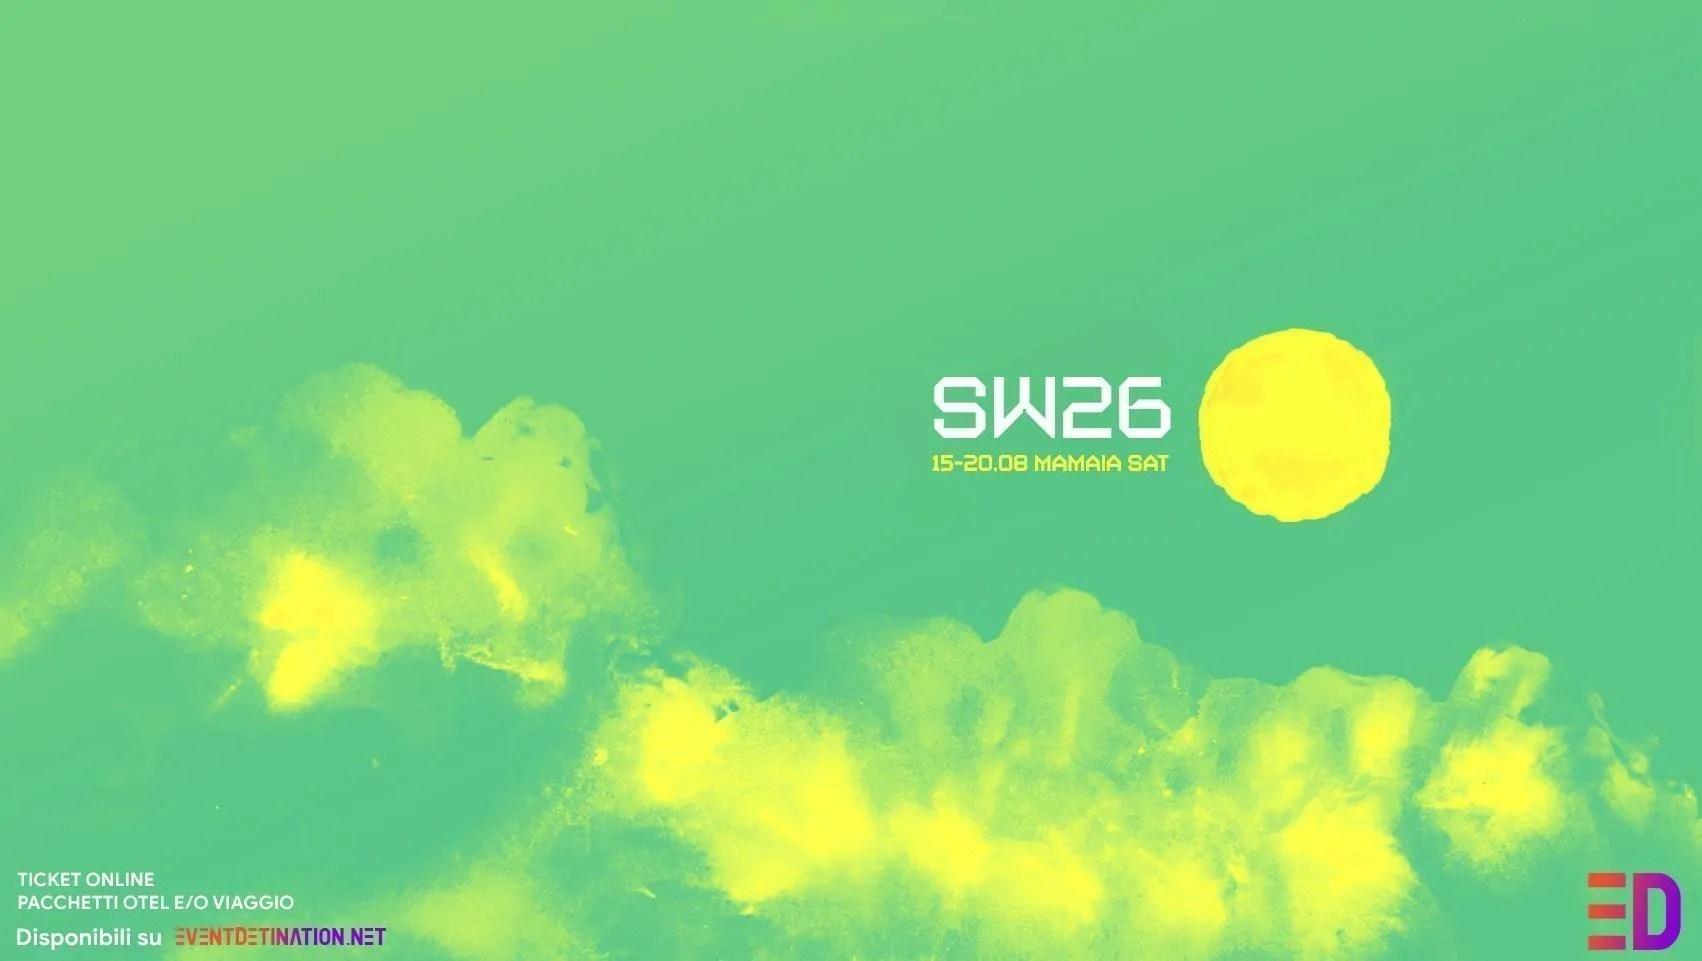 SUNWAVES 2019 Festival SUMMER EDITION Mamaia Romania SW26 | 15 – 20  Agosto | Ticket Pacchetti hotel